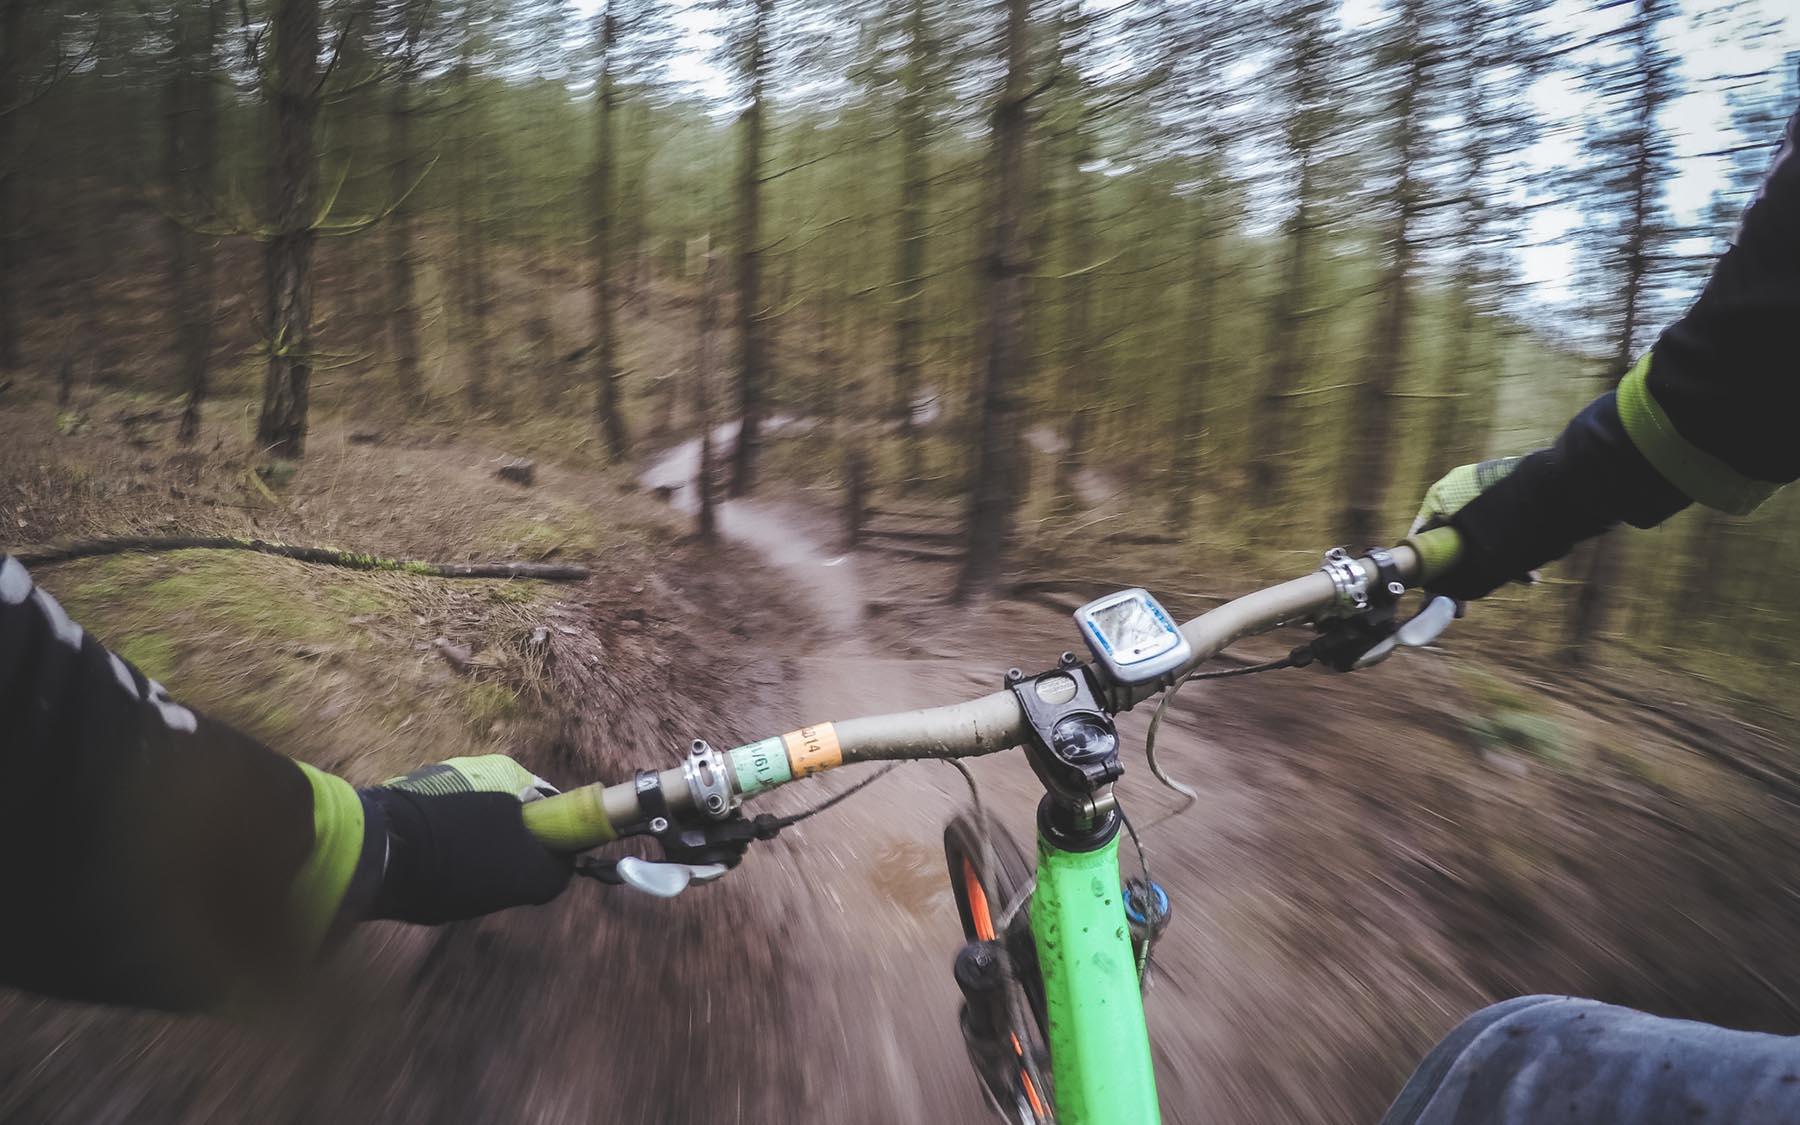 Mountain biking through woods